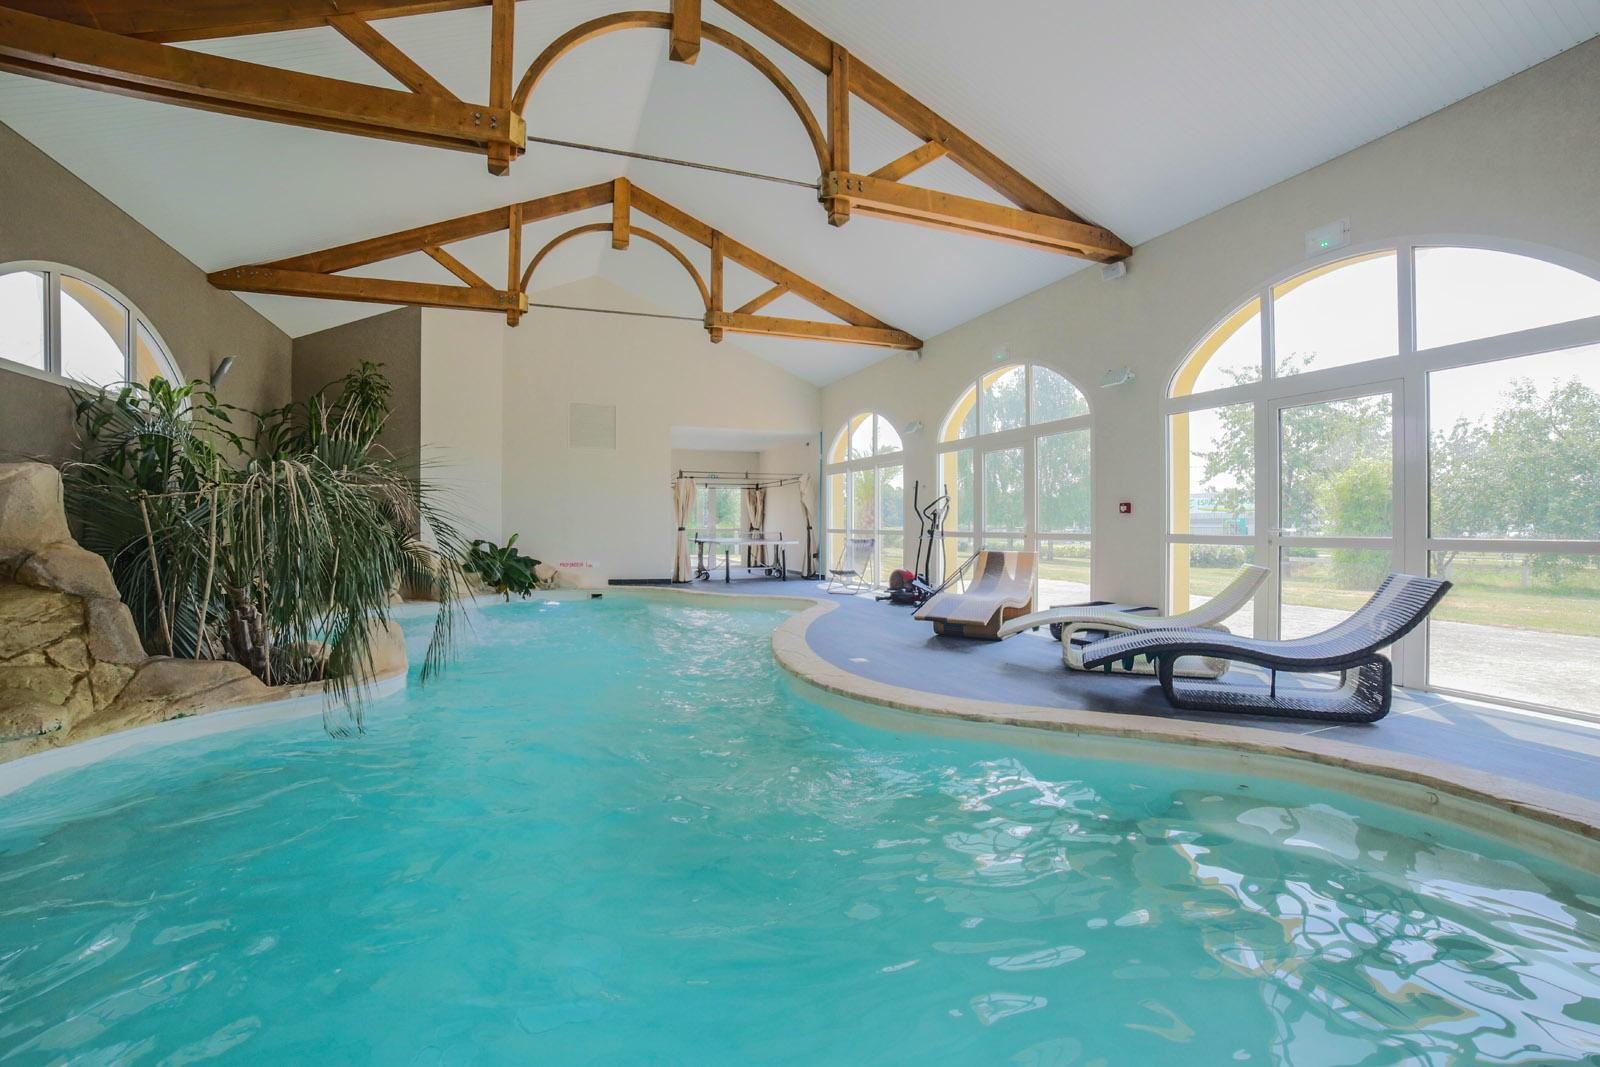 Espace piscine sauna hammam hotel de la lou e for Piscine sauna